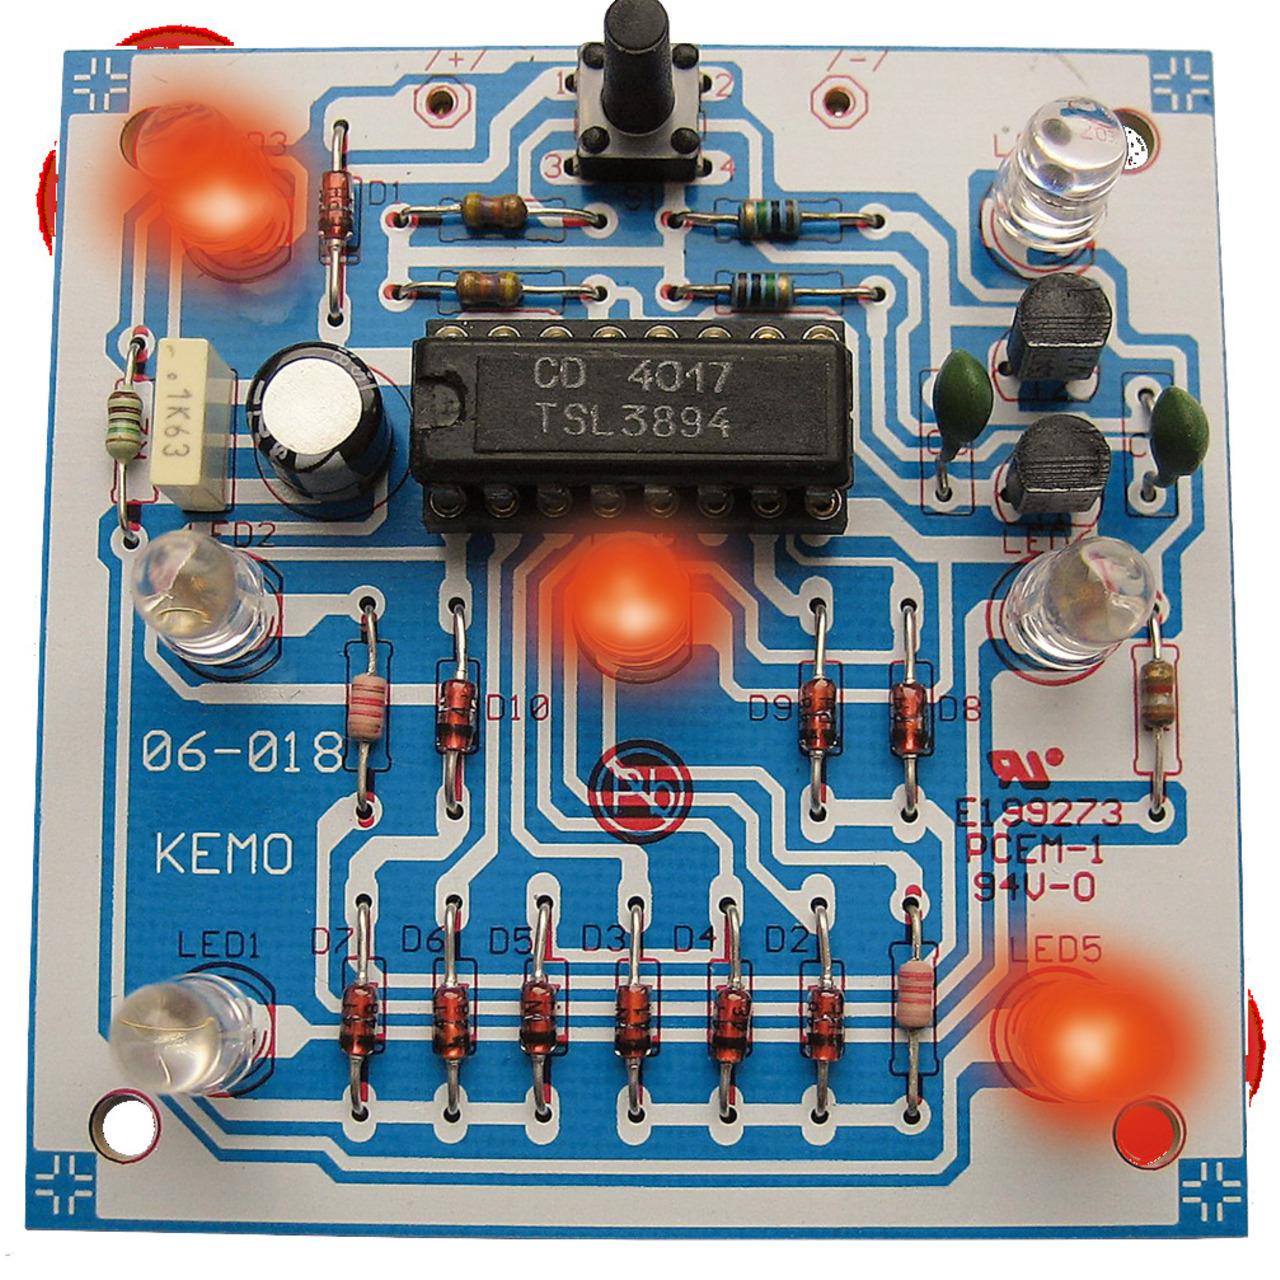 Kemo Bausatz B093 Elektronischer Würfel